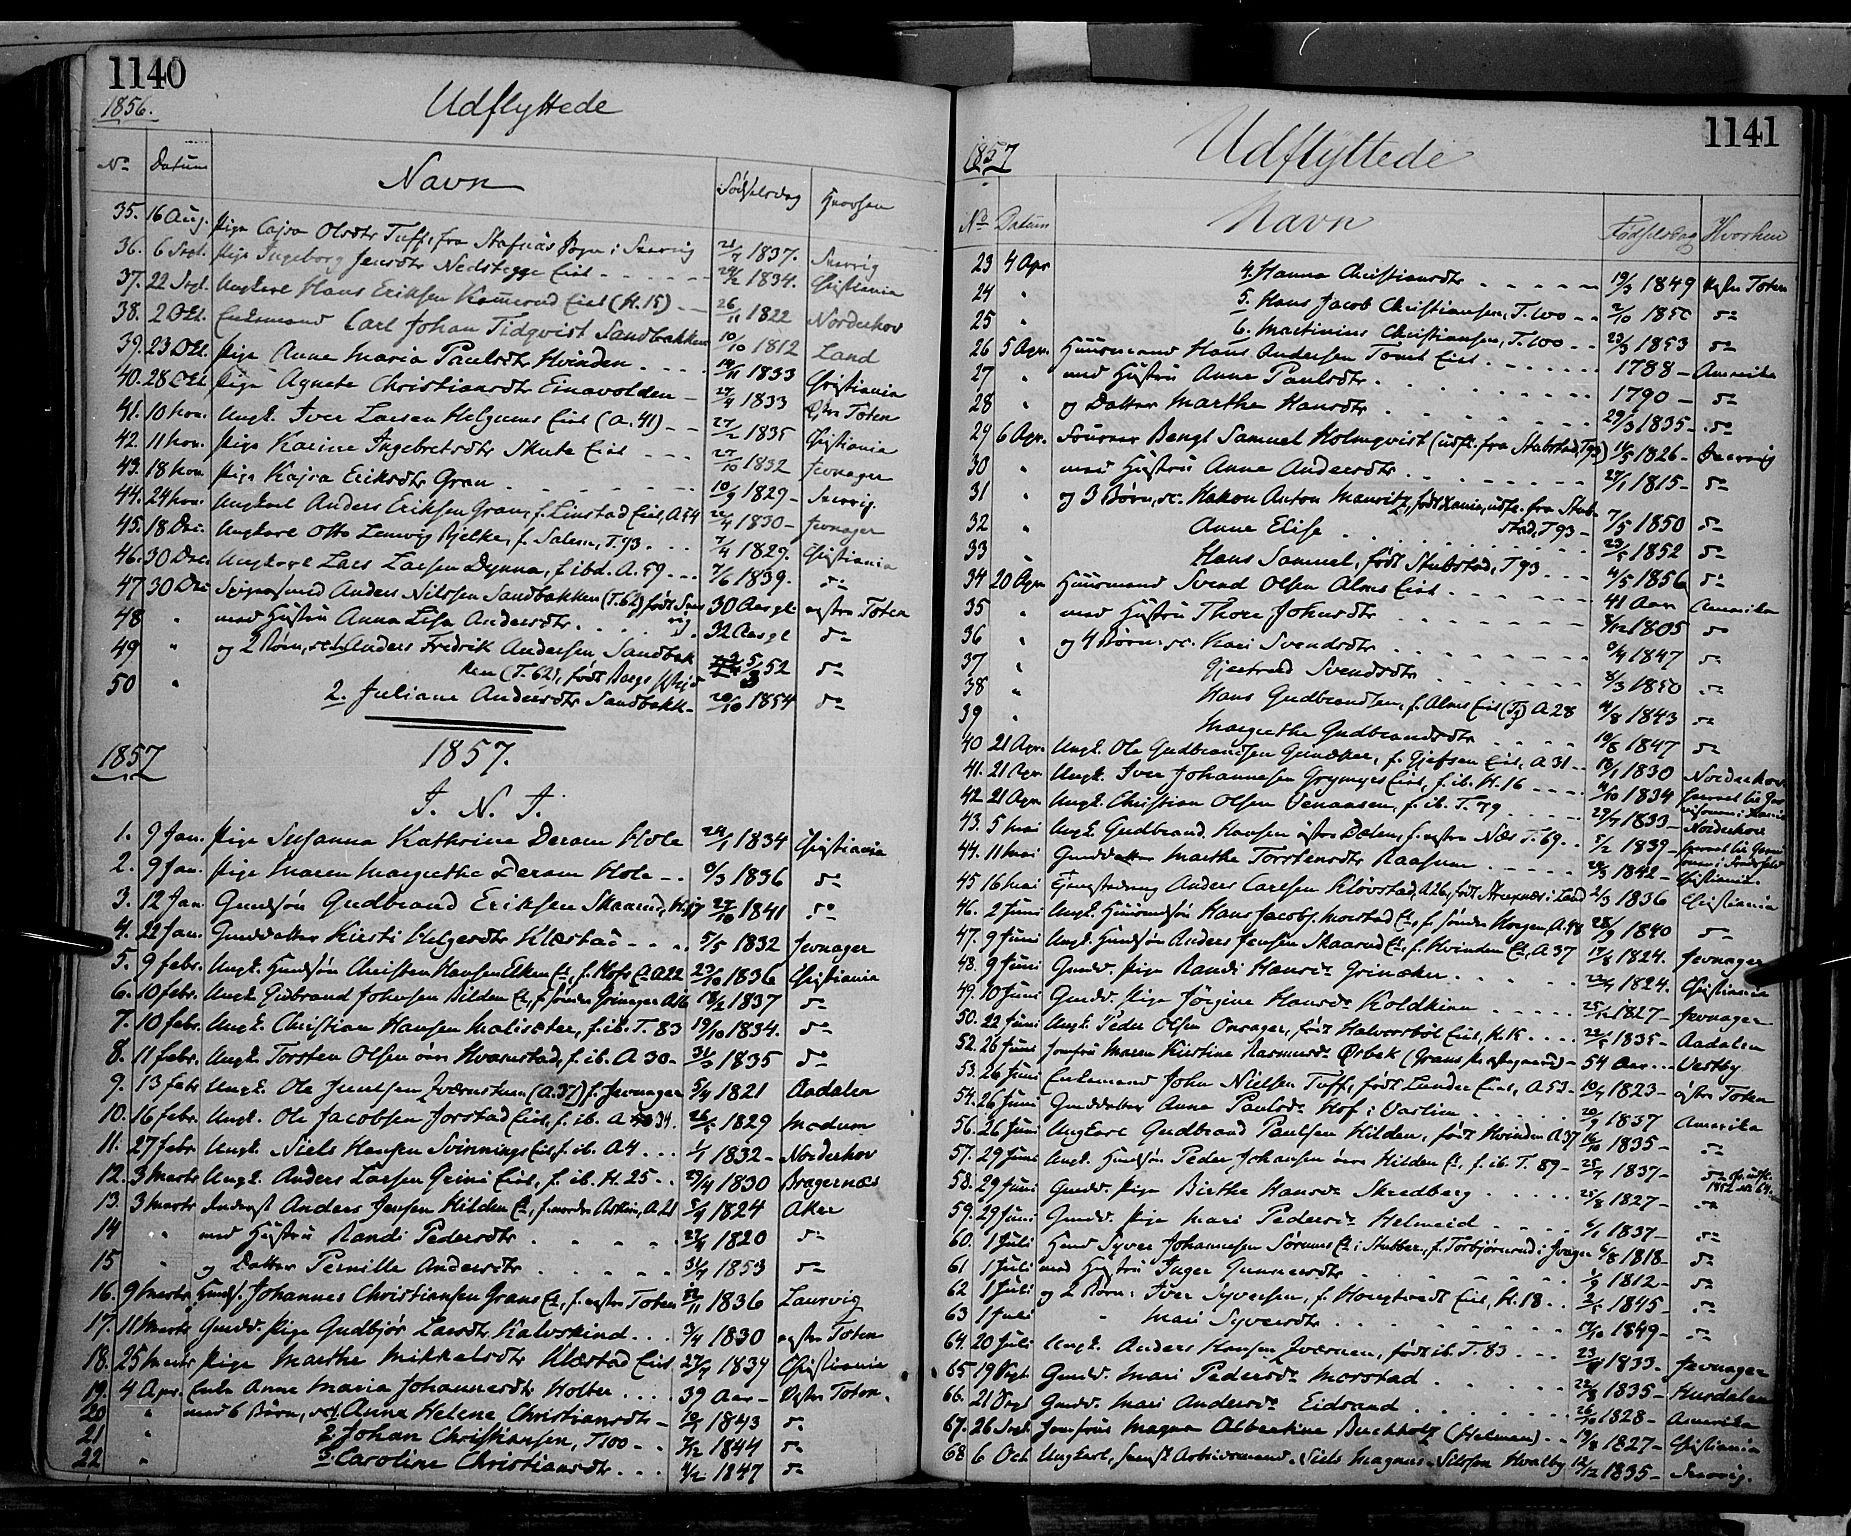 SAH, Gran prestekontor, Ministerialbok nr. 12, 1856-1874, s. 1140-1141